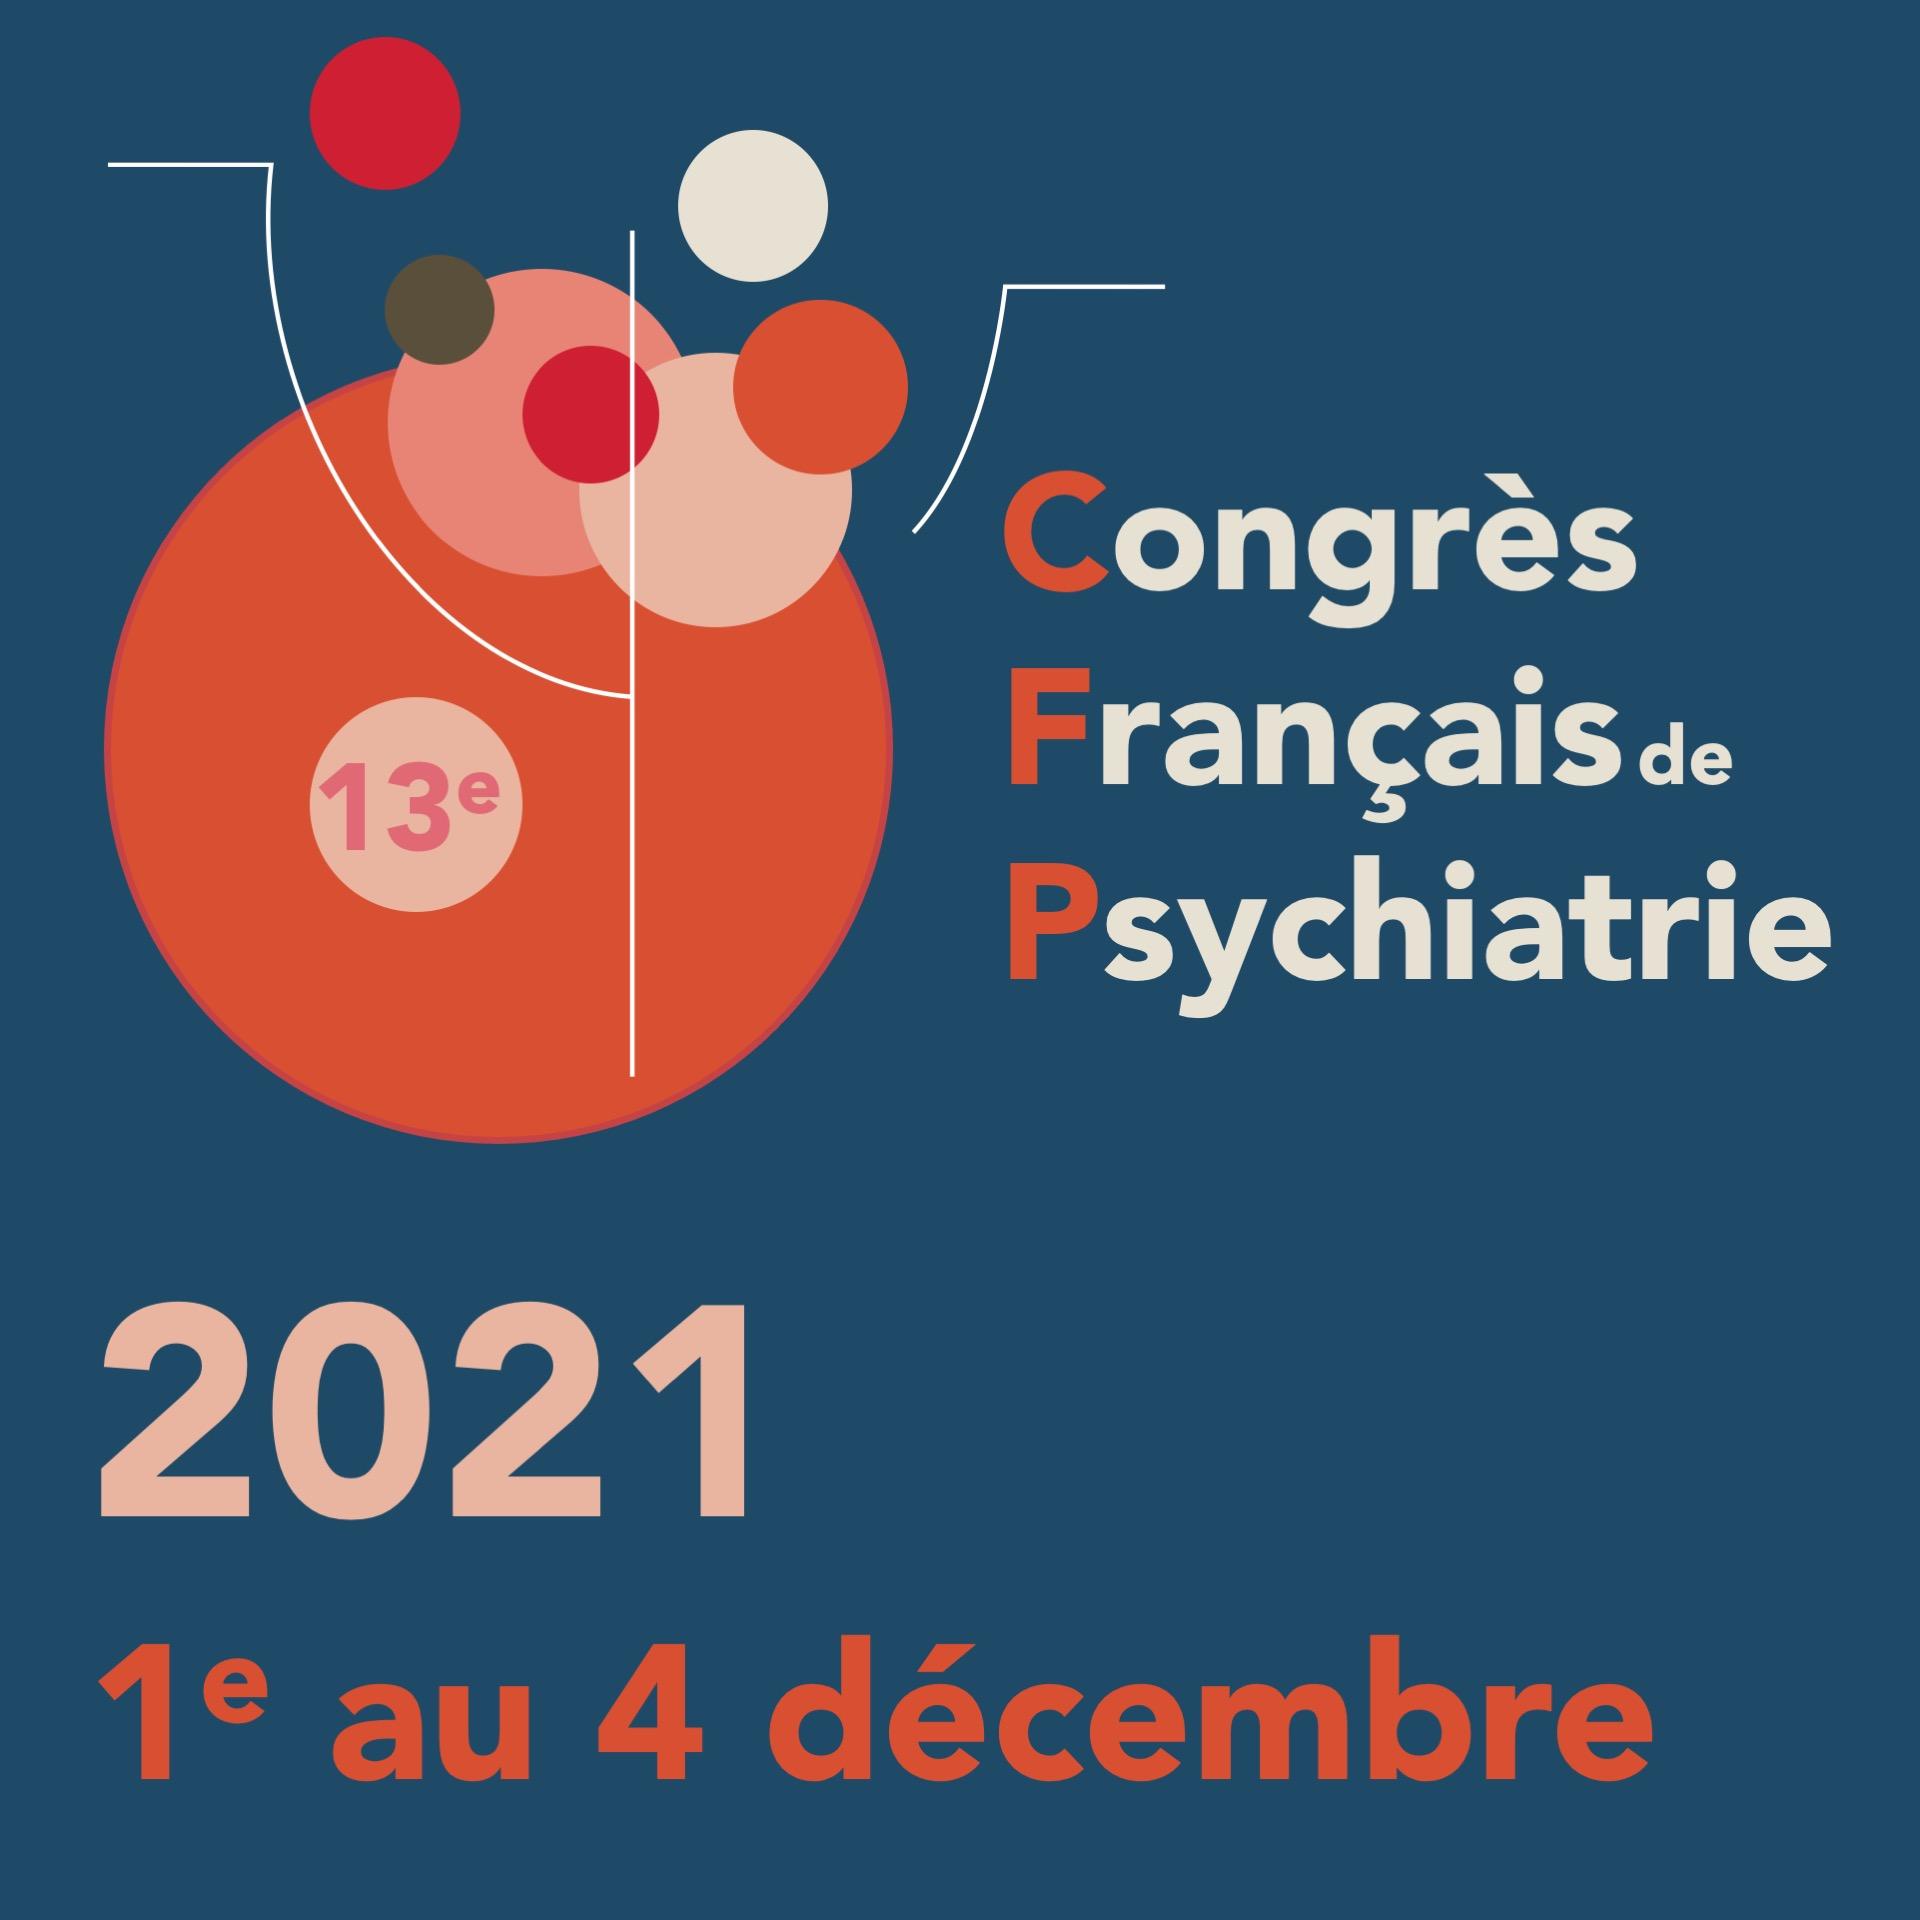 Congrès Français de Psychiatrie